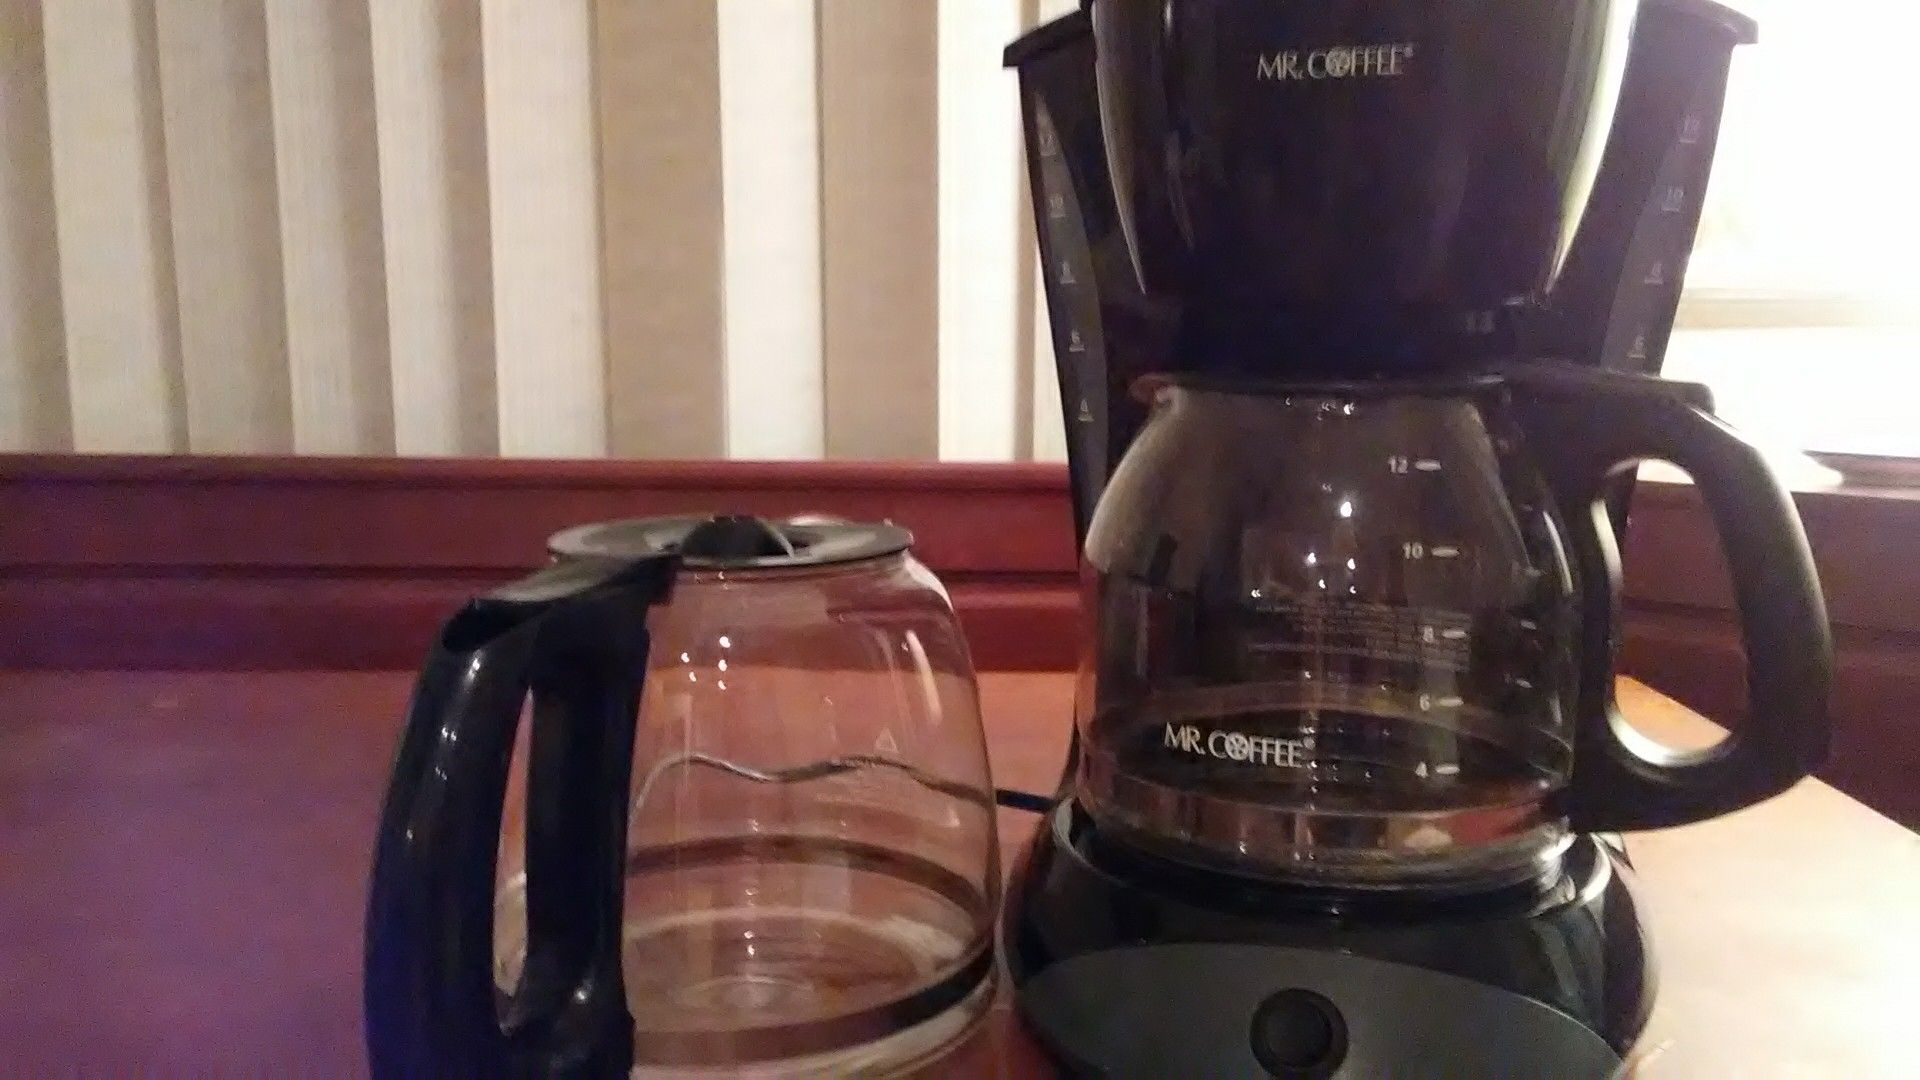 Coffee machine and extra pot